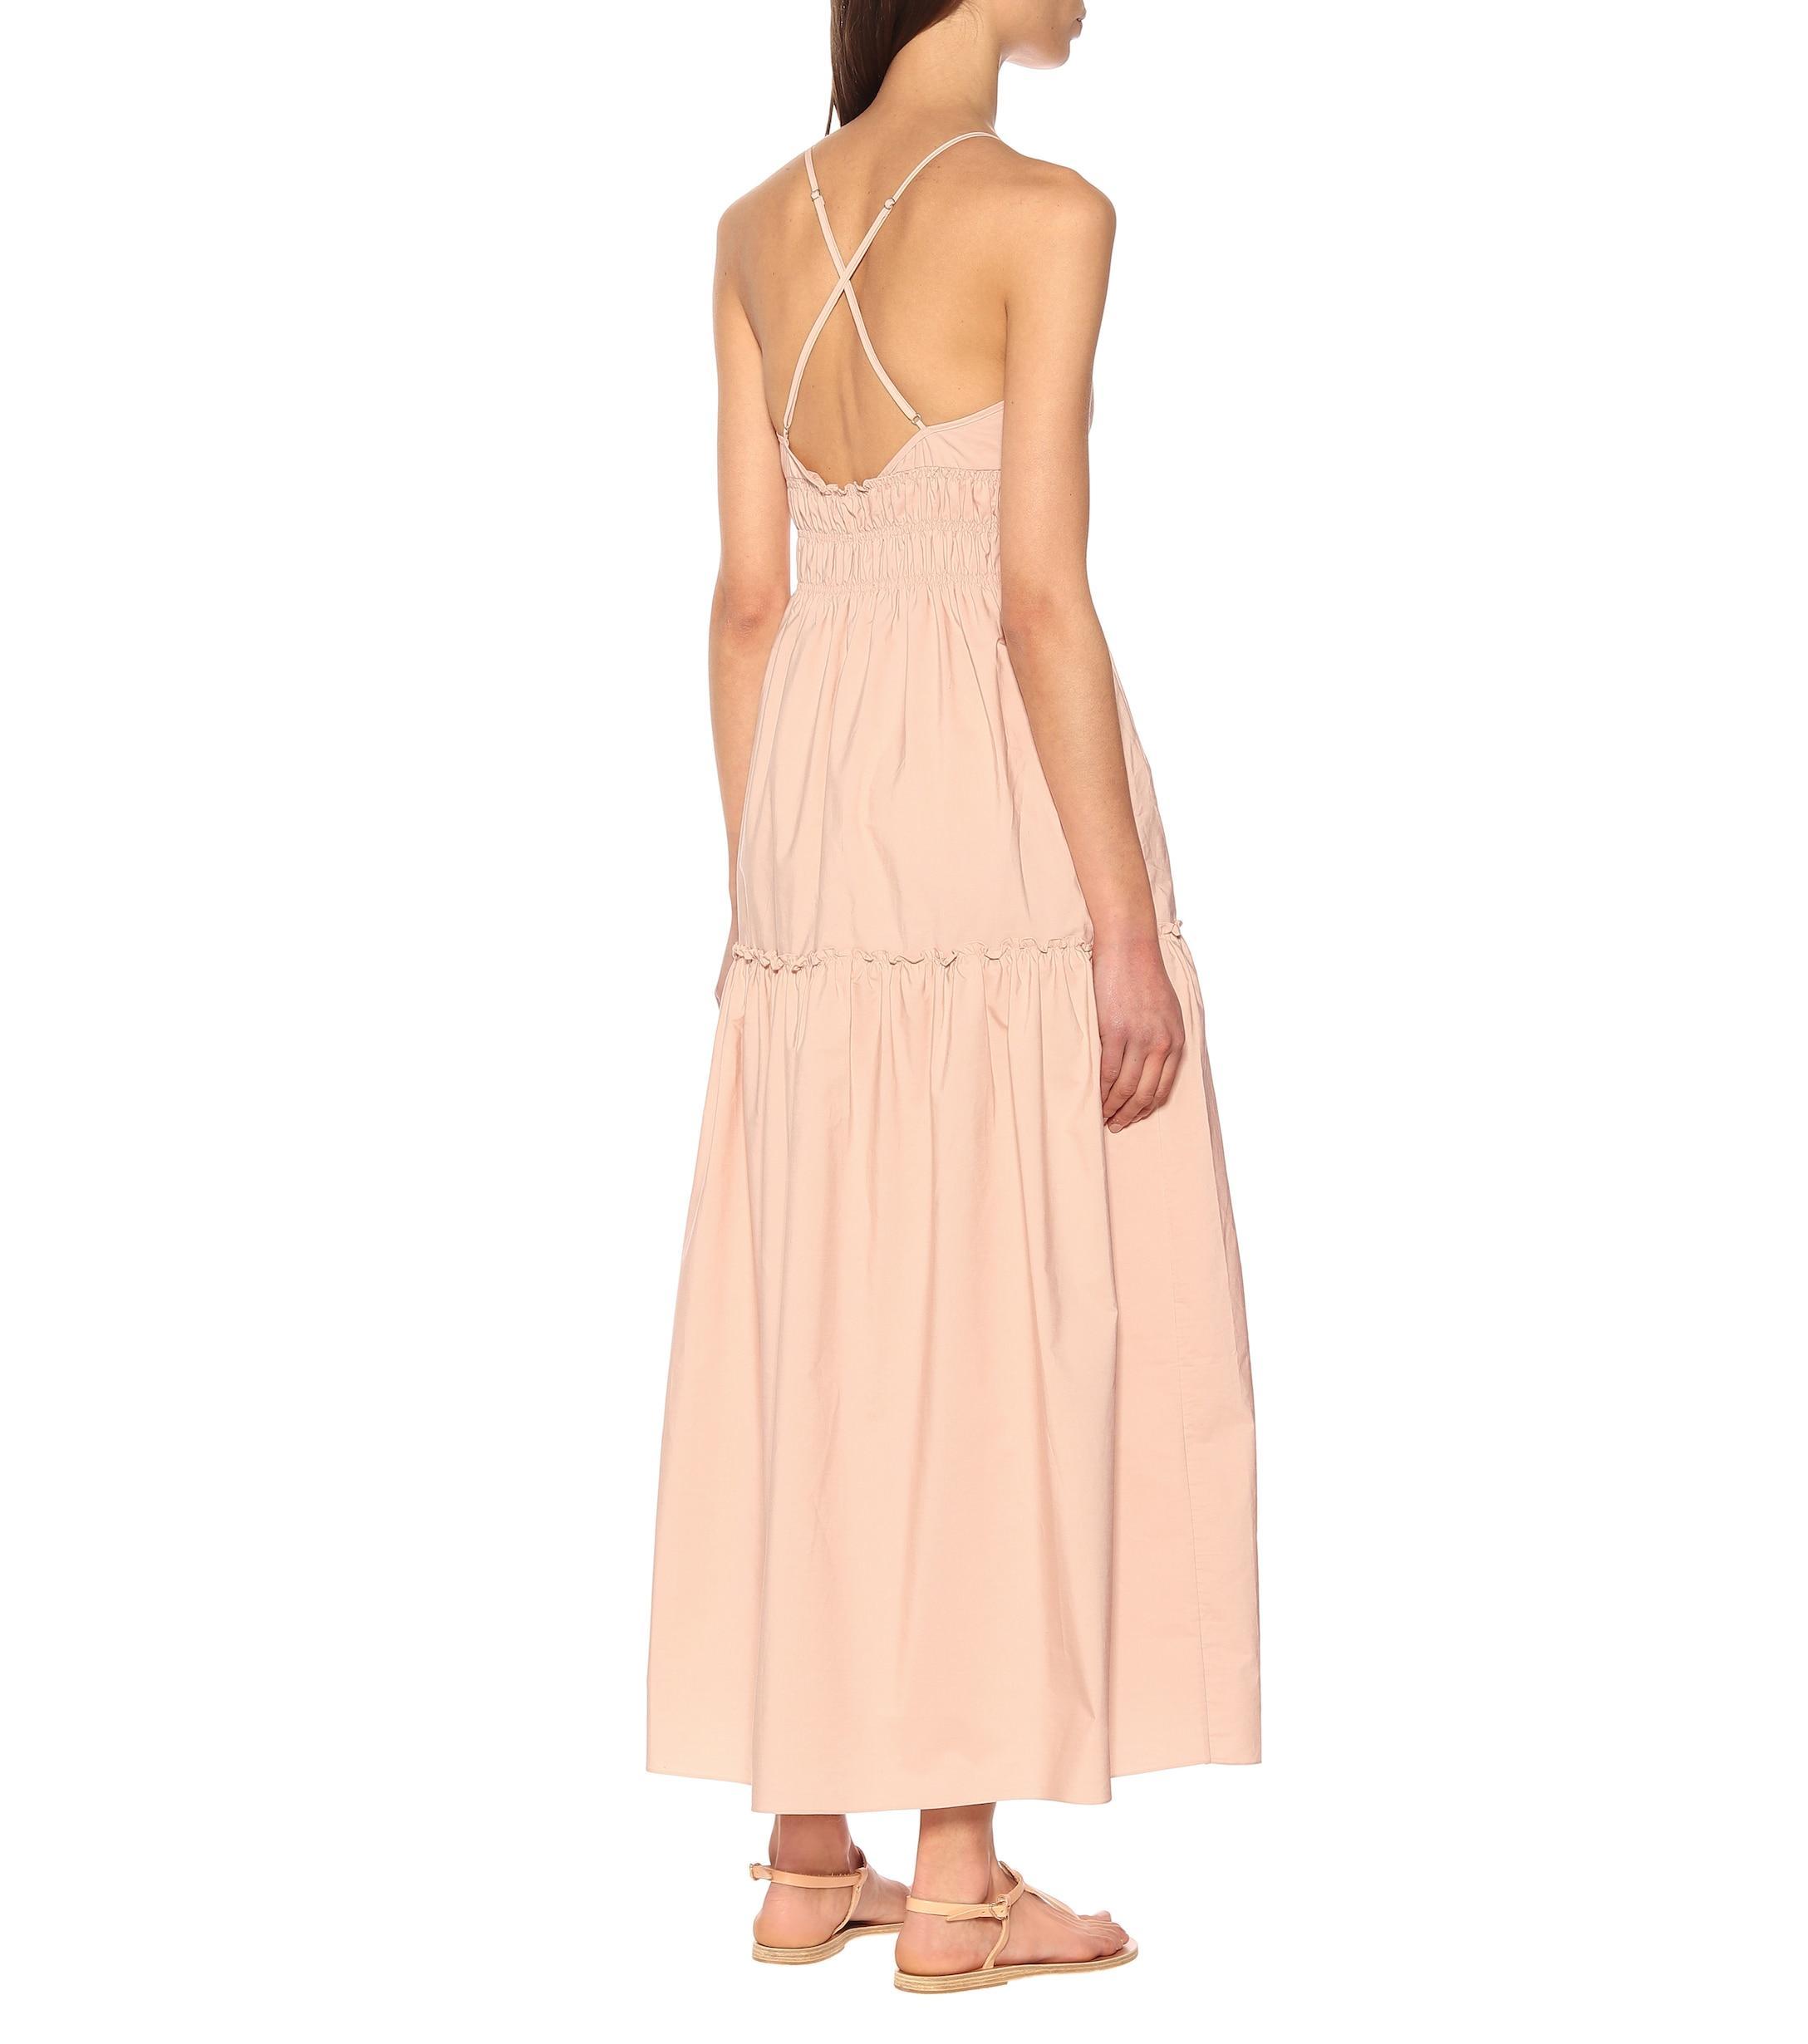 Cotton Emma Three London Dress Pink Lyst In Graces qRw1S